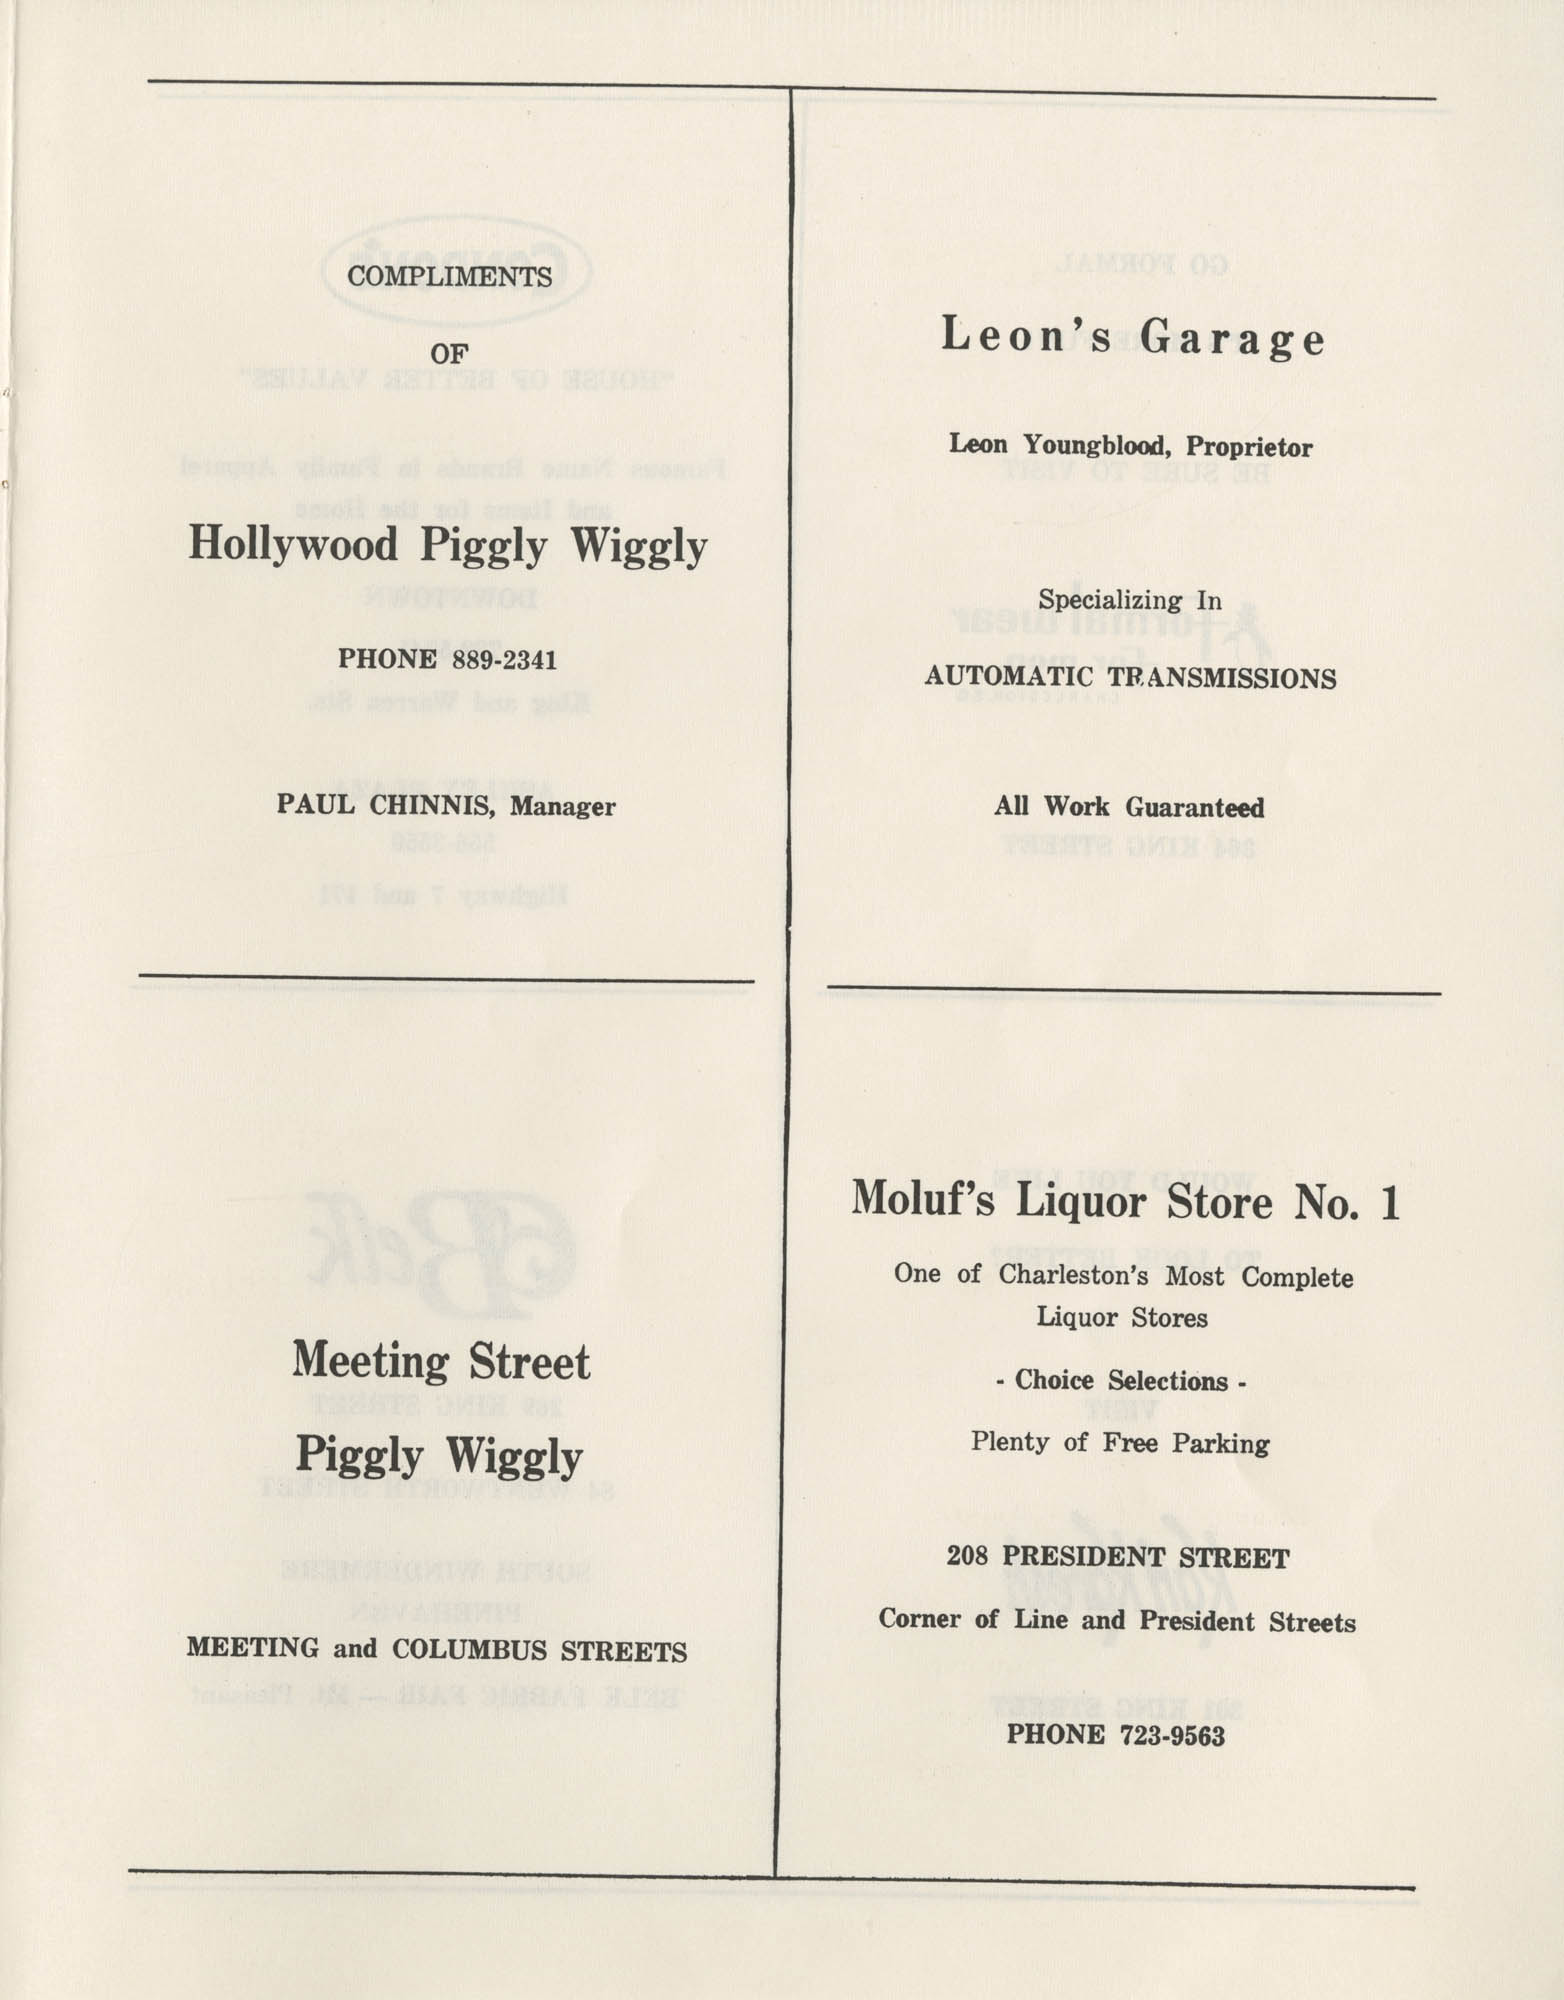 1972 Appreciation Dinner Program, Page 21